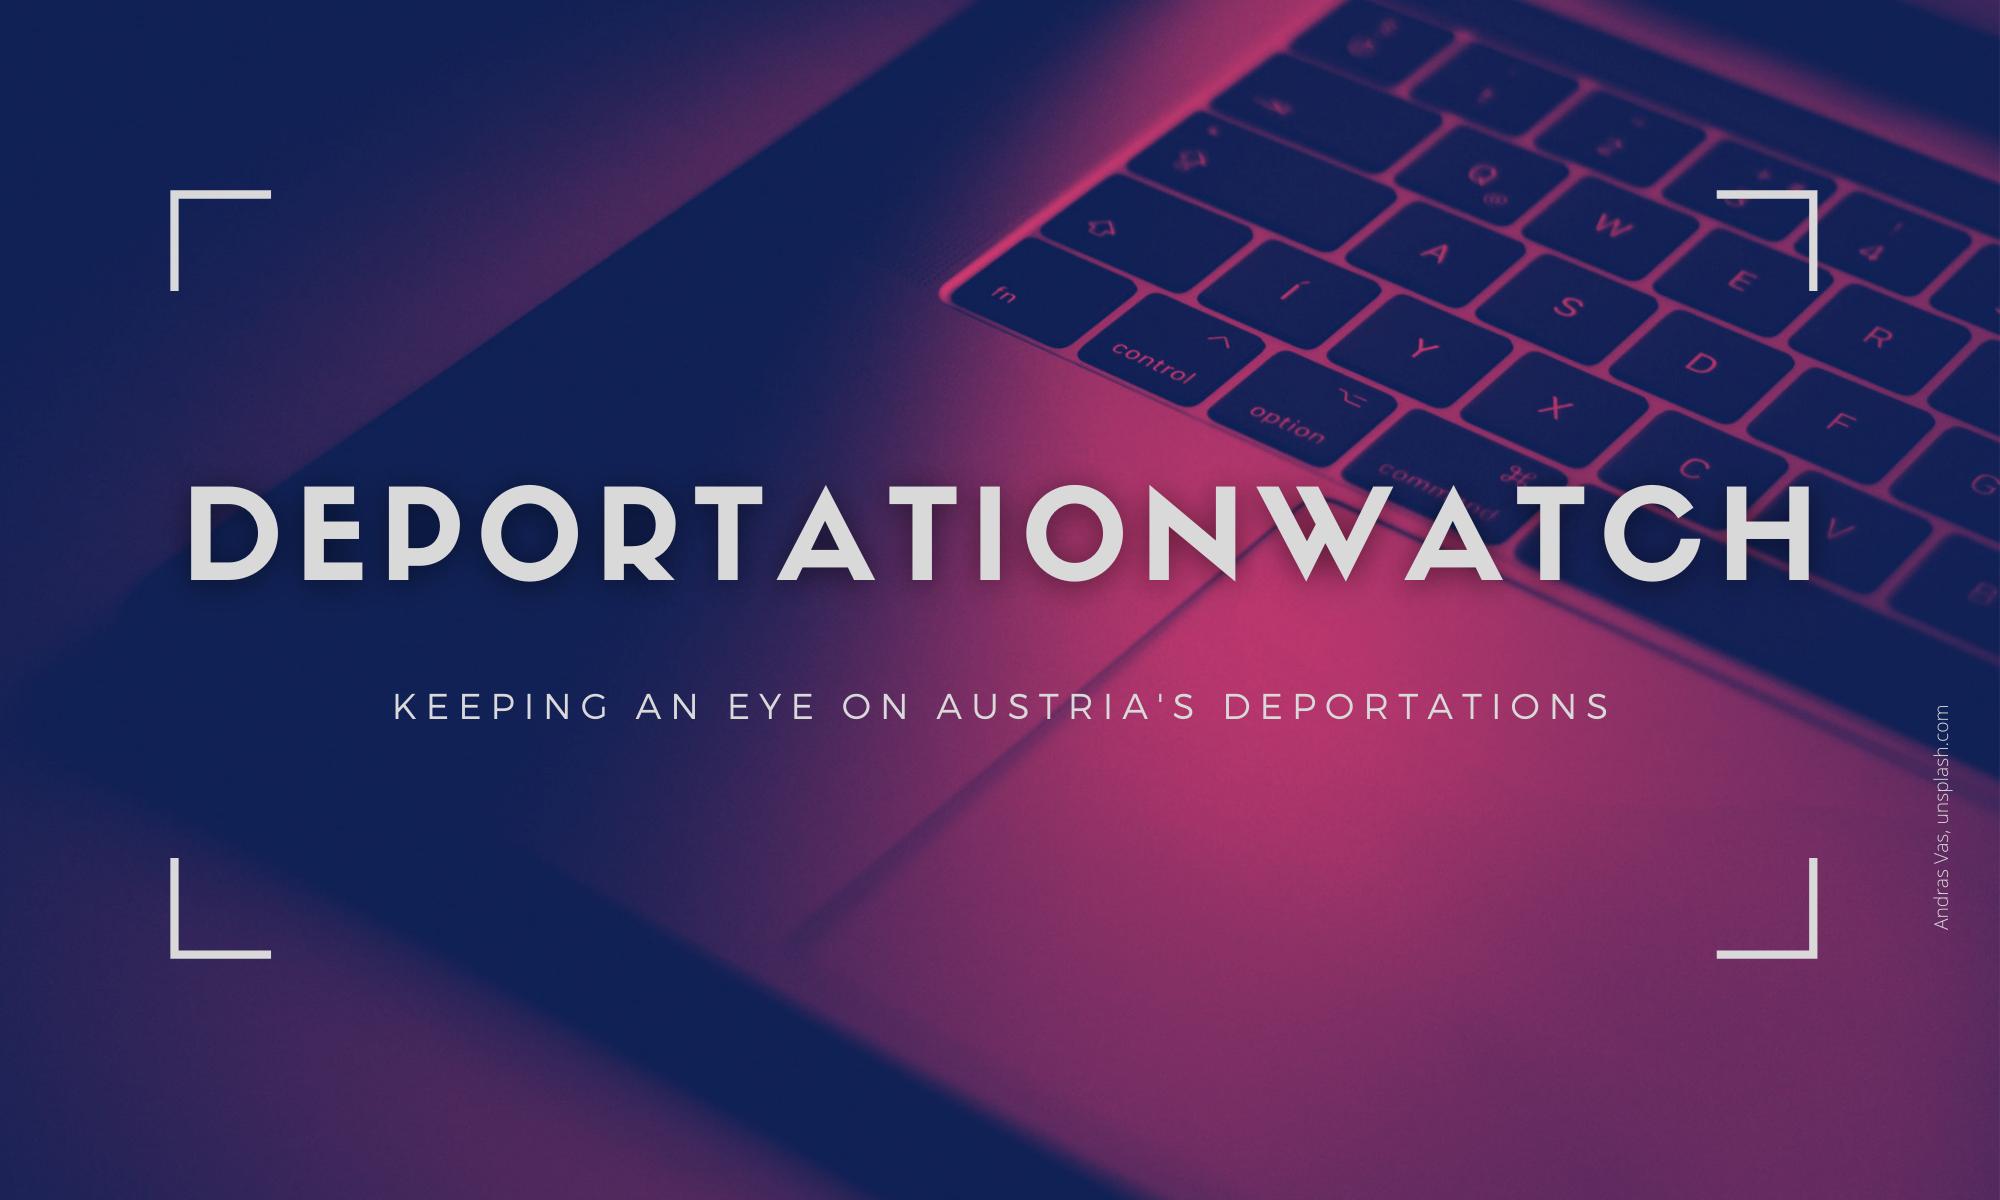 Deportationwatch